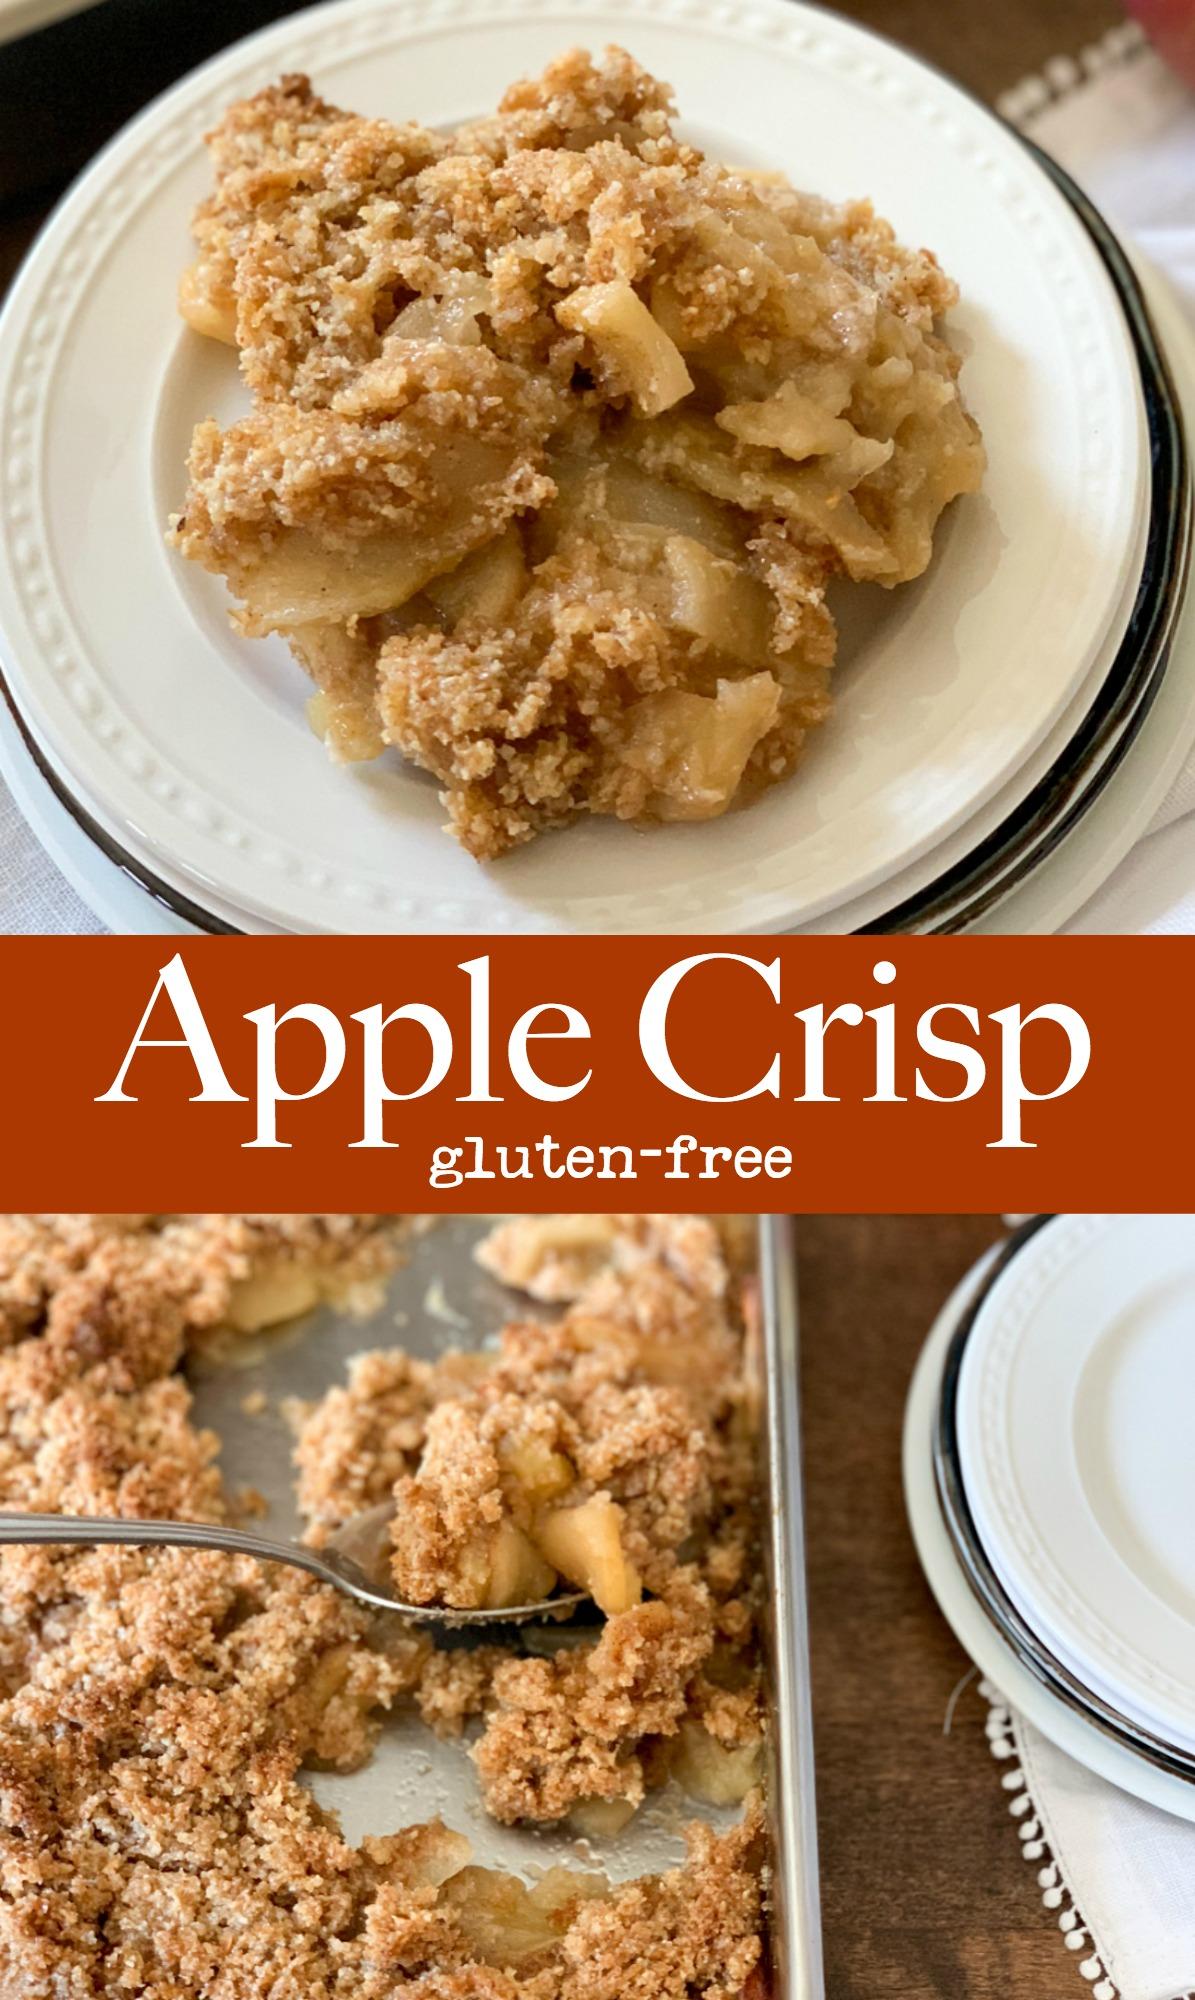 Delicious yummy gluten-free apple crisp.